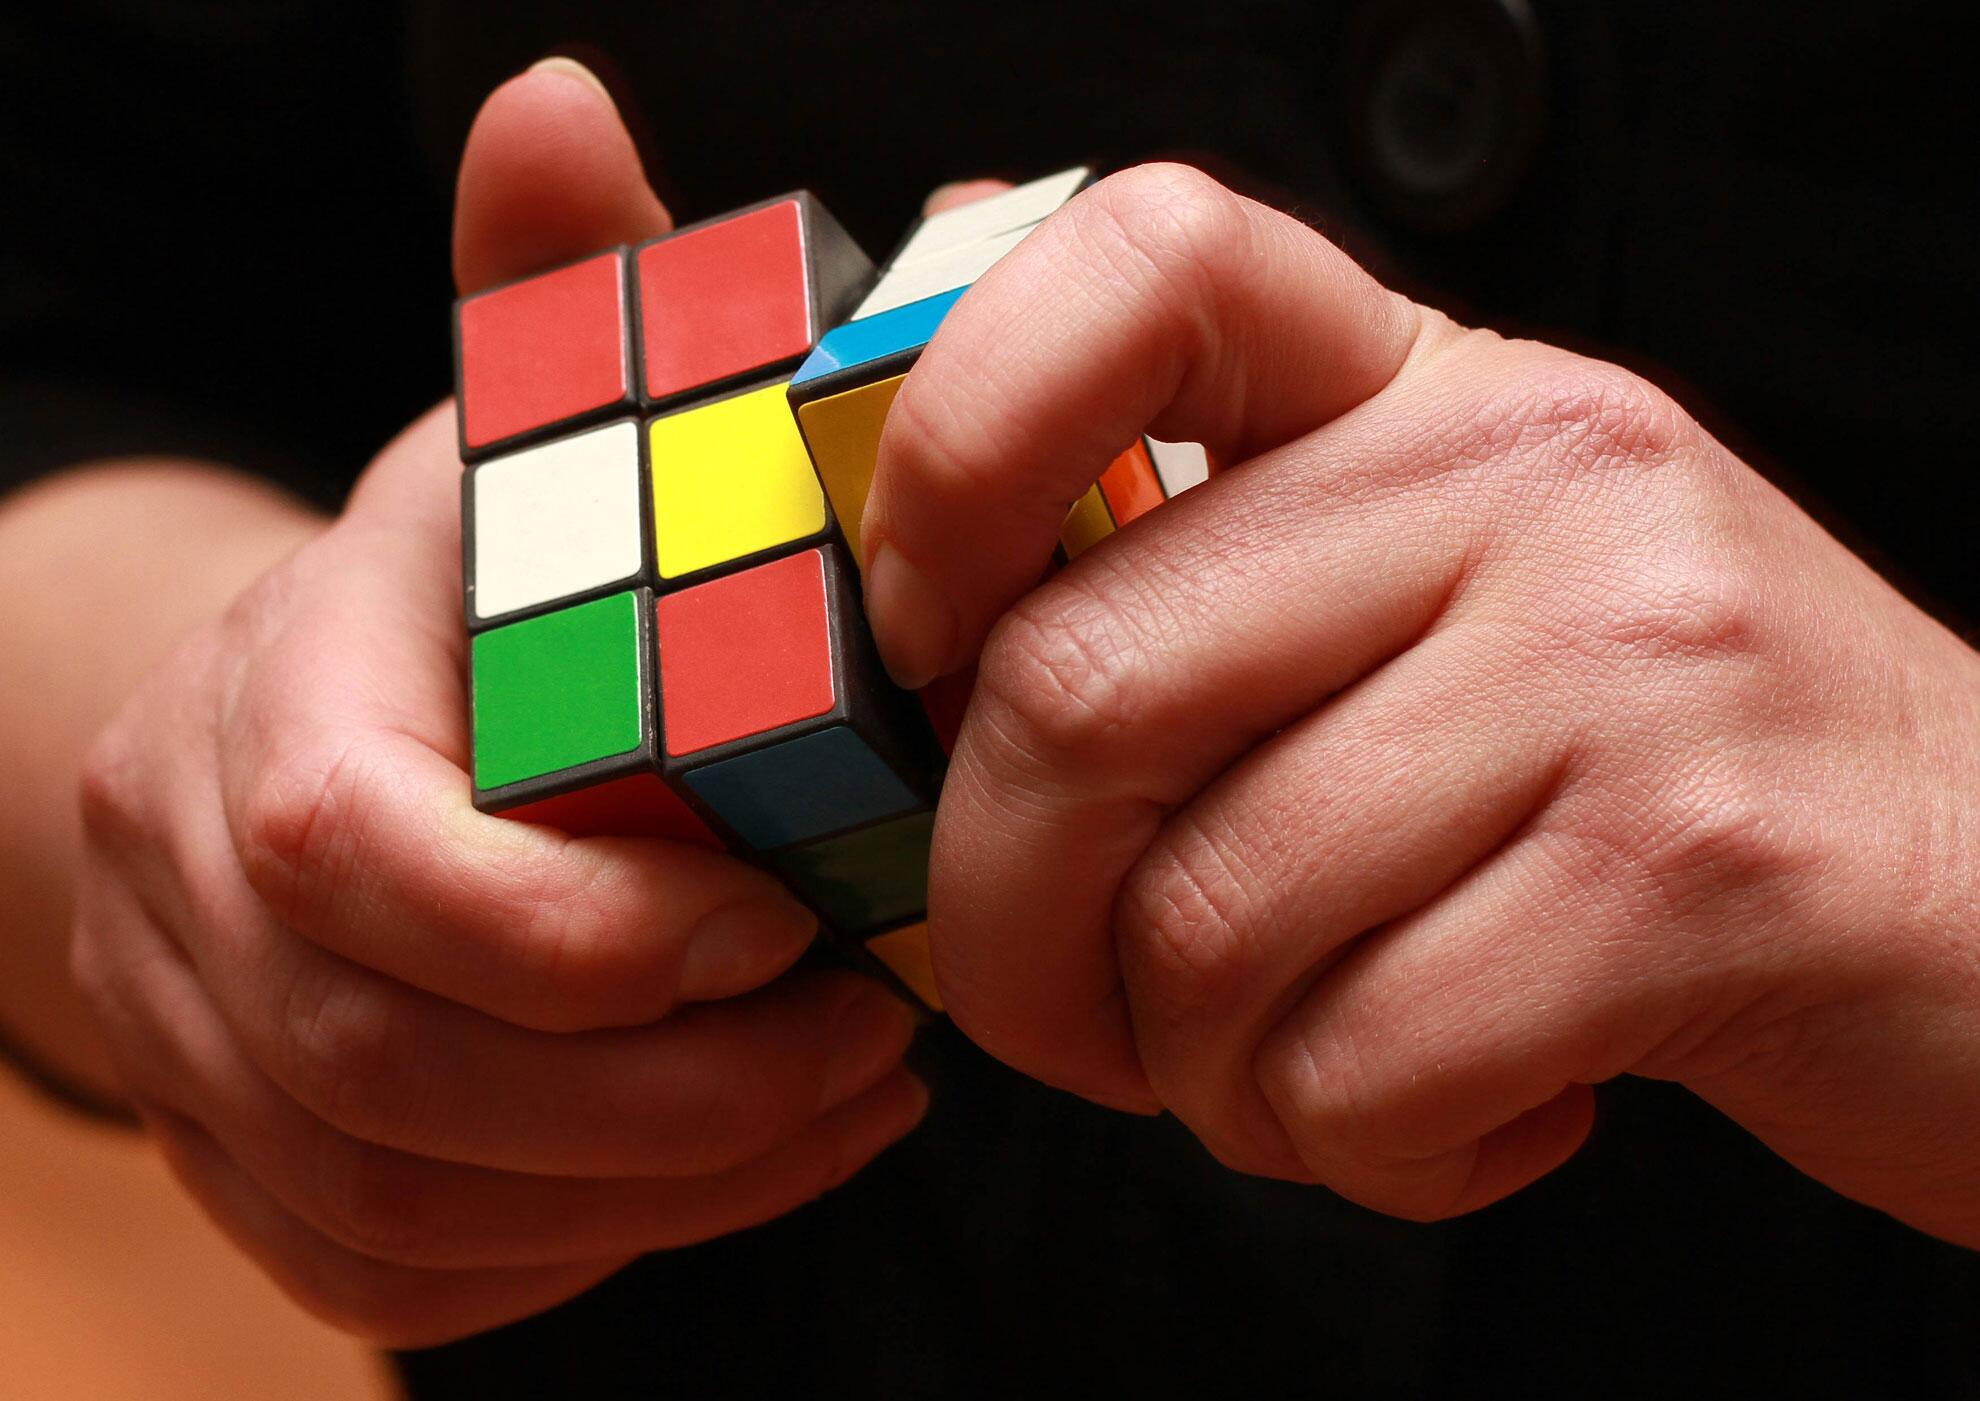 Bild zu Zauberwürfel, Rubik's Cube